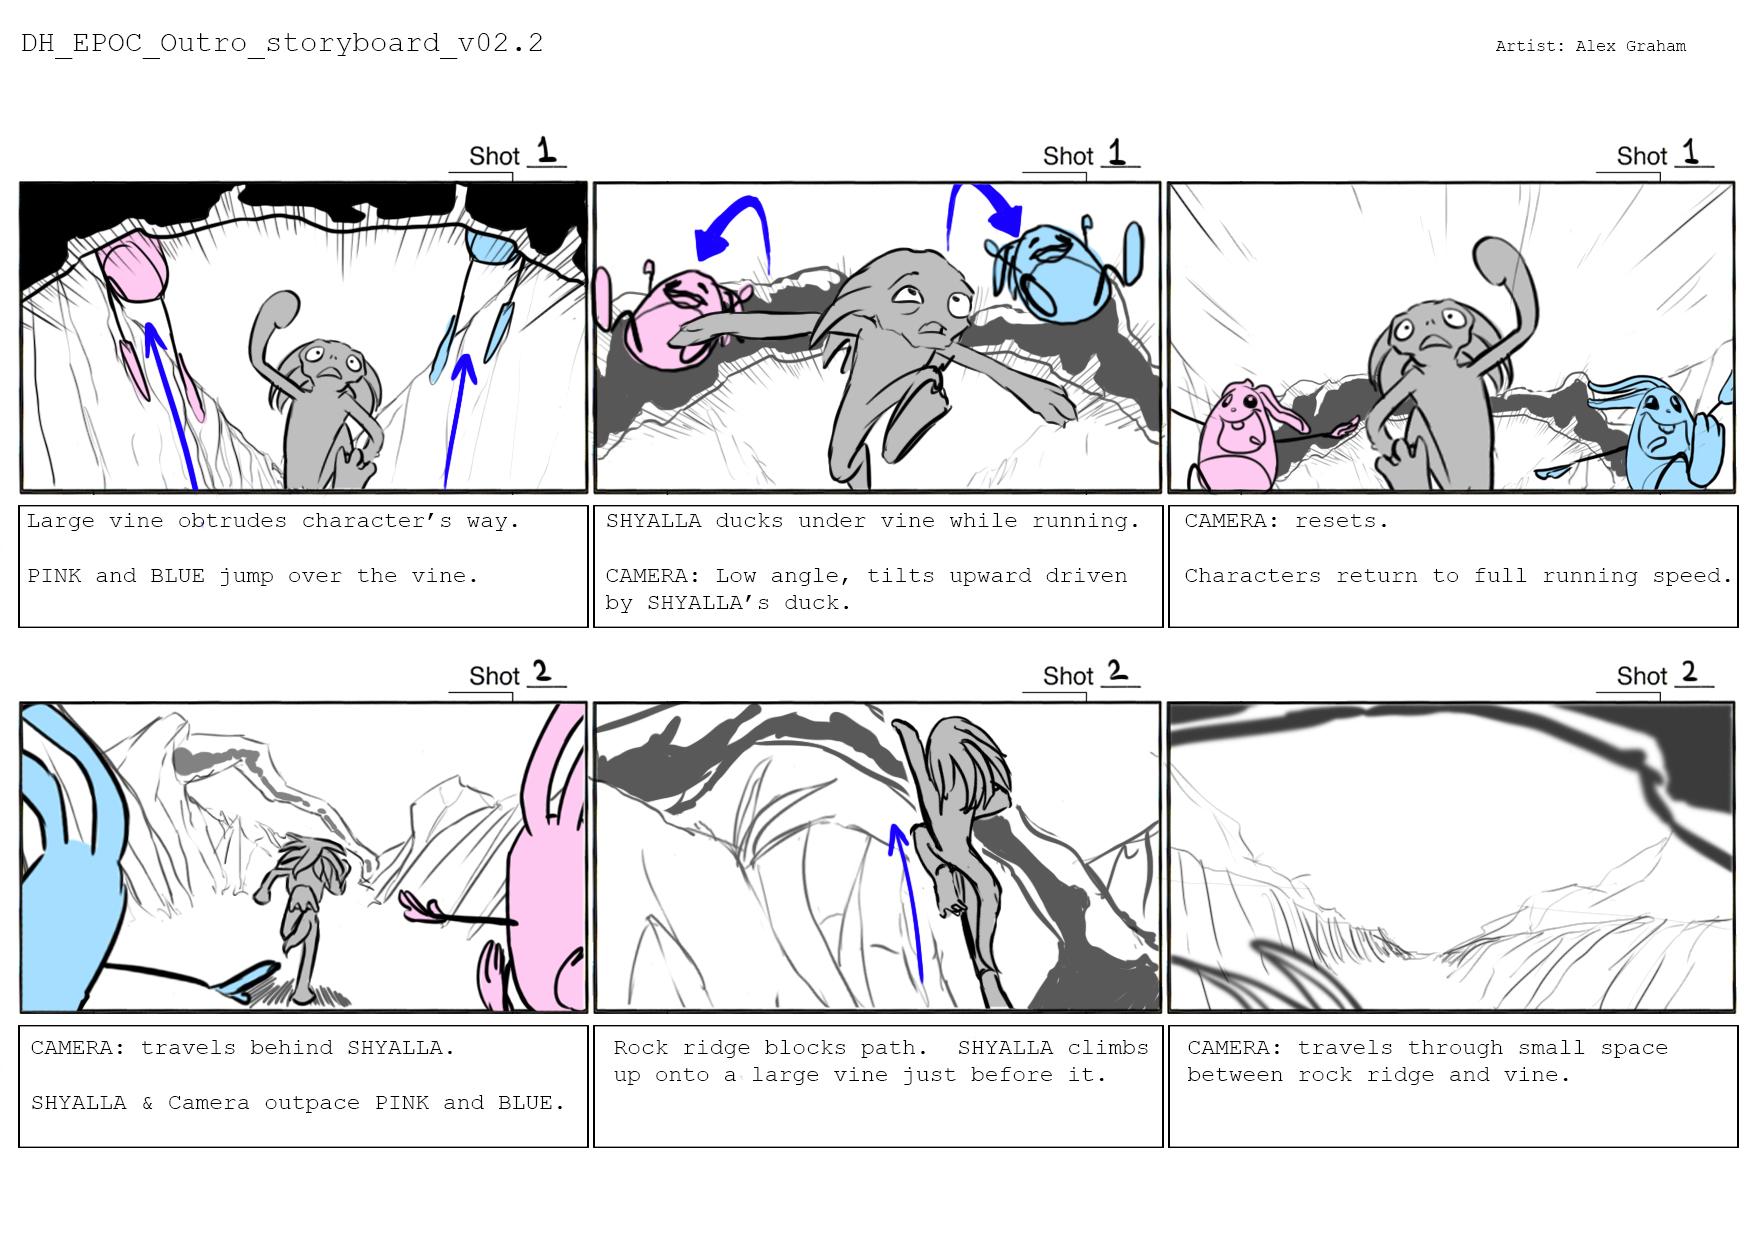 ABG_storyboard_09